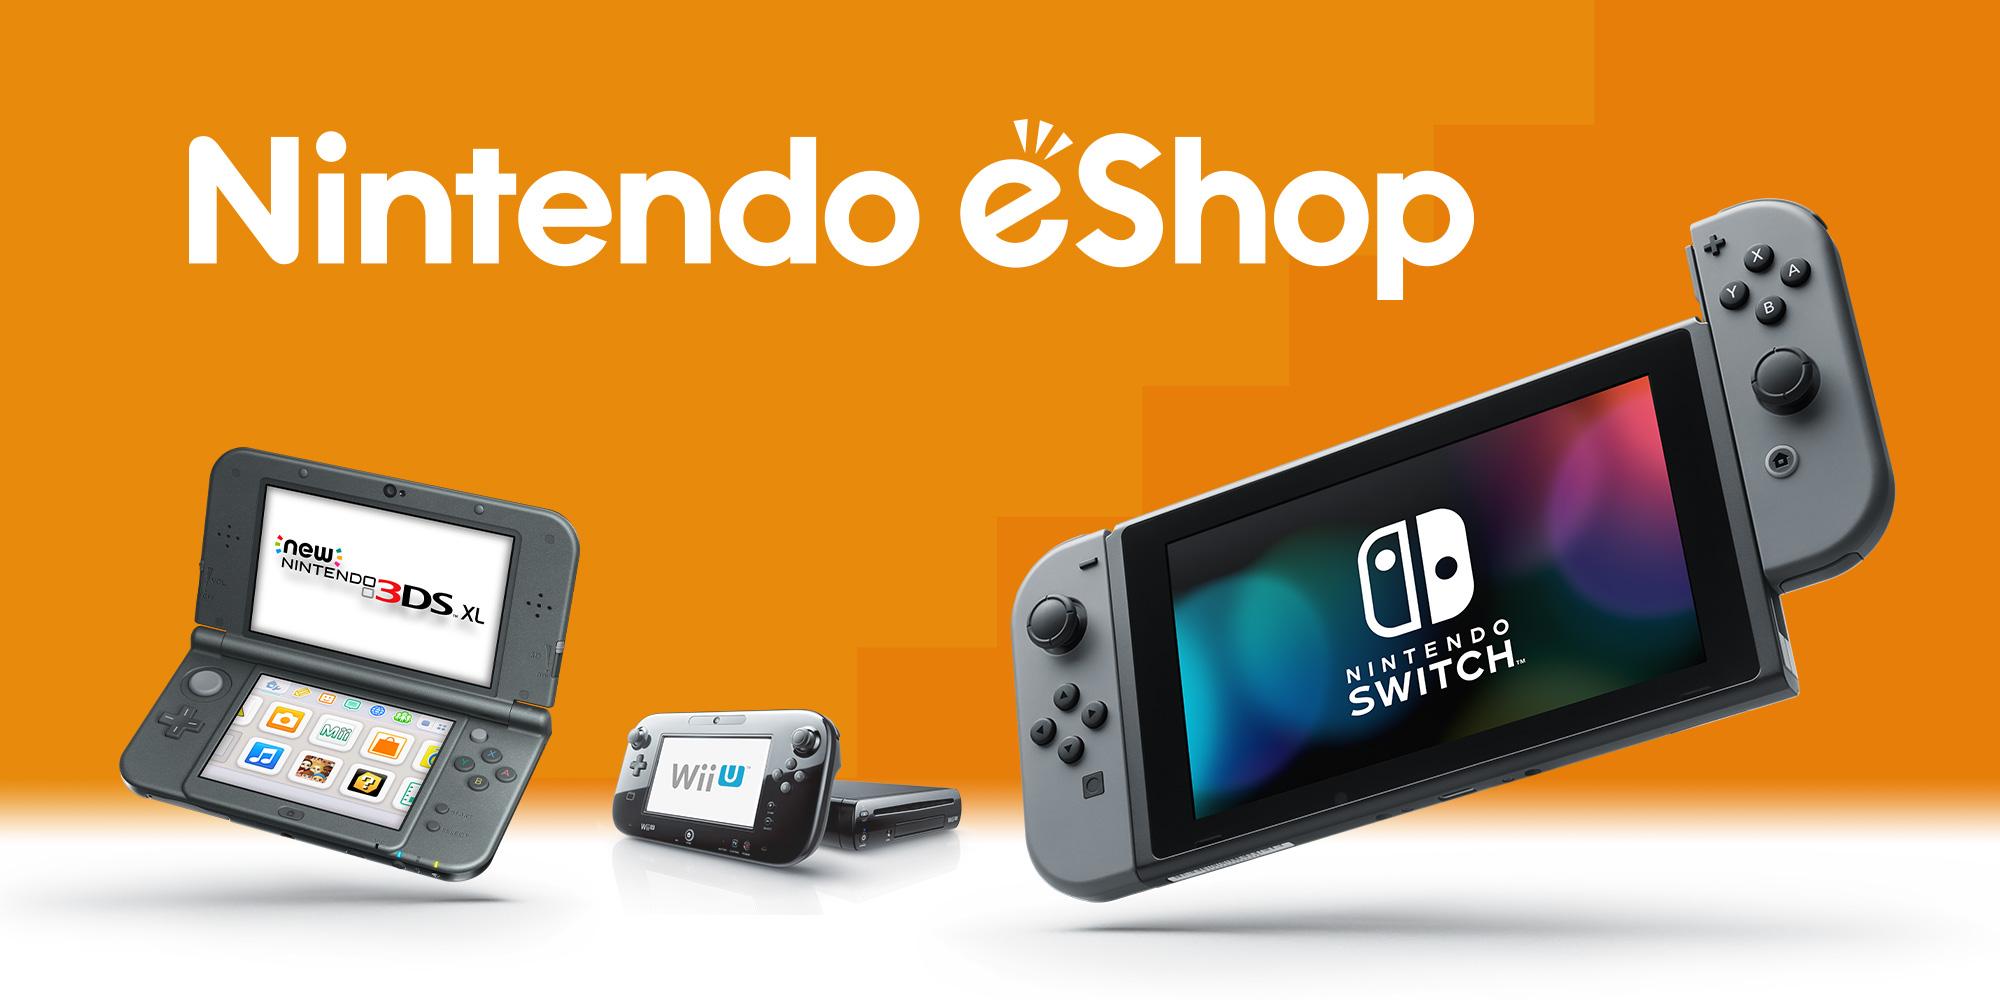 Mua Nintendo Eshop giá rẻ